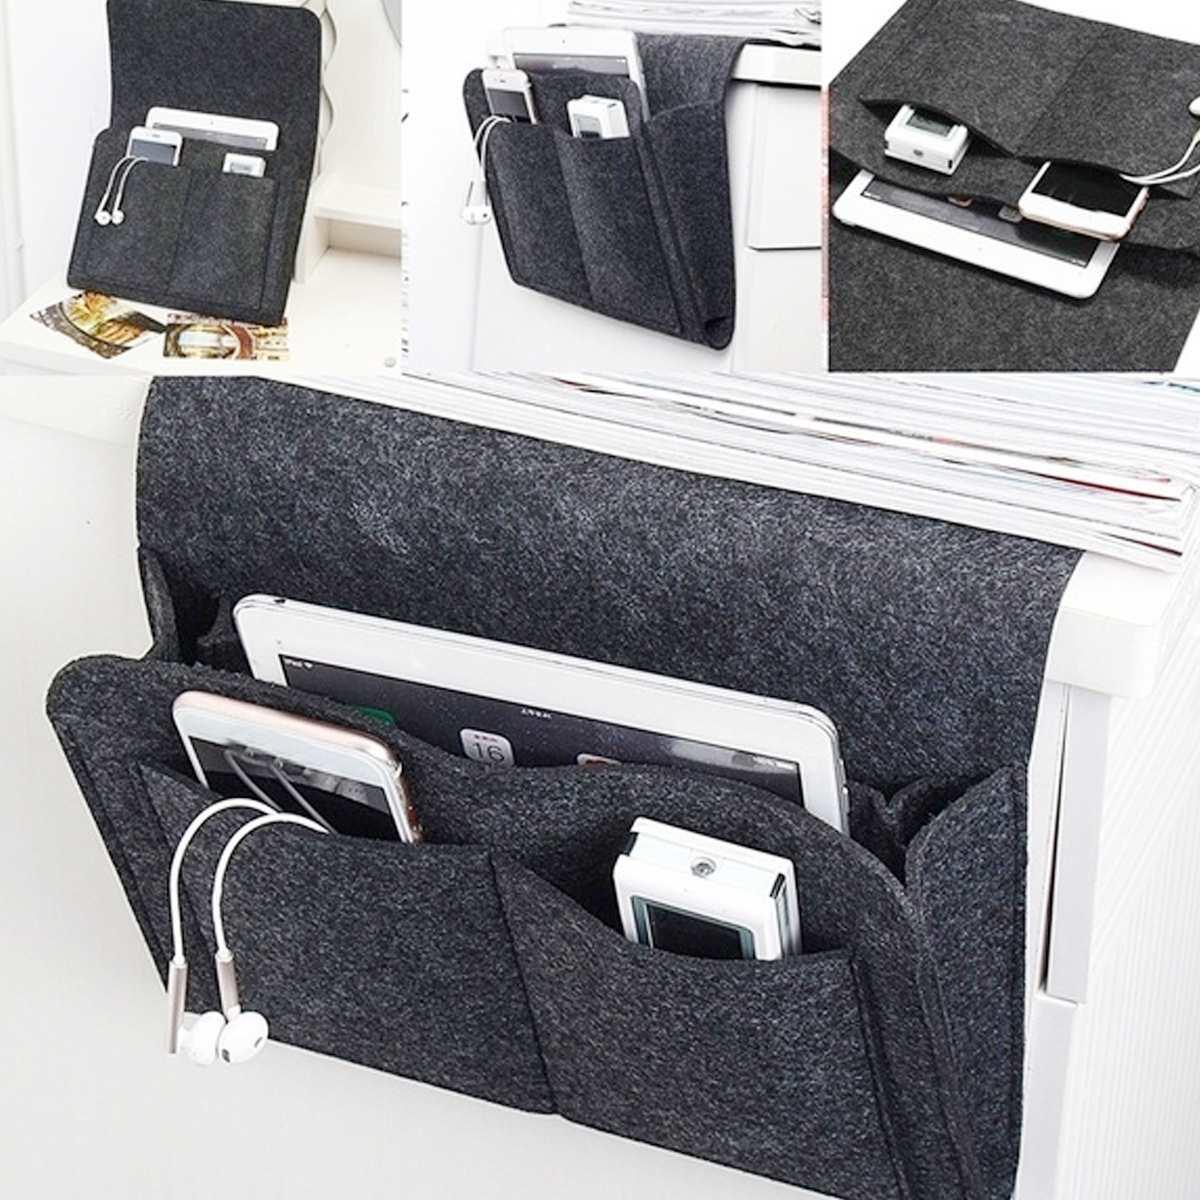 Organizador de almacenamiento para cabecera de cama de fieltro, bolsa de escritorio para cama, sofá, TV, mando a distancia, organizador de bolsillo para dormitorio, colegio o dormitorio